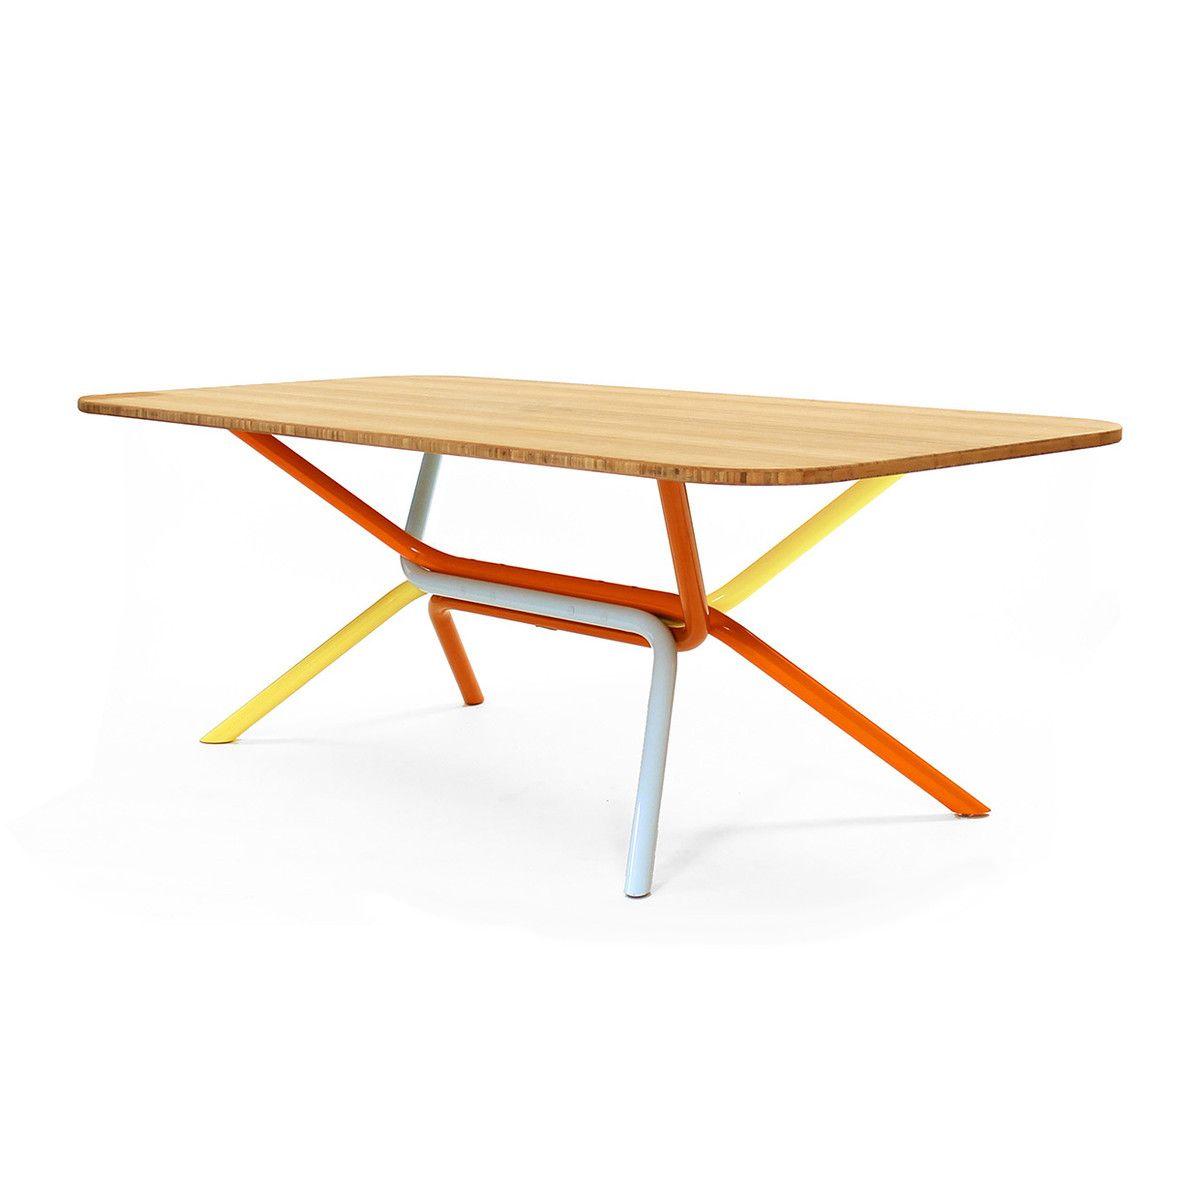 Incredible Ross Lovegrove Table By Modern Design Market Table Design Creativecarmelina Interior Chair Design Creativecarmelinacom